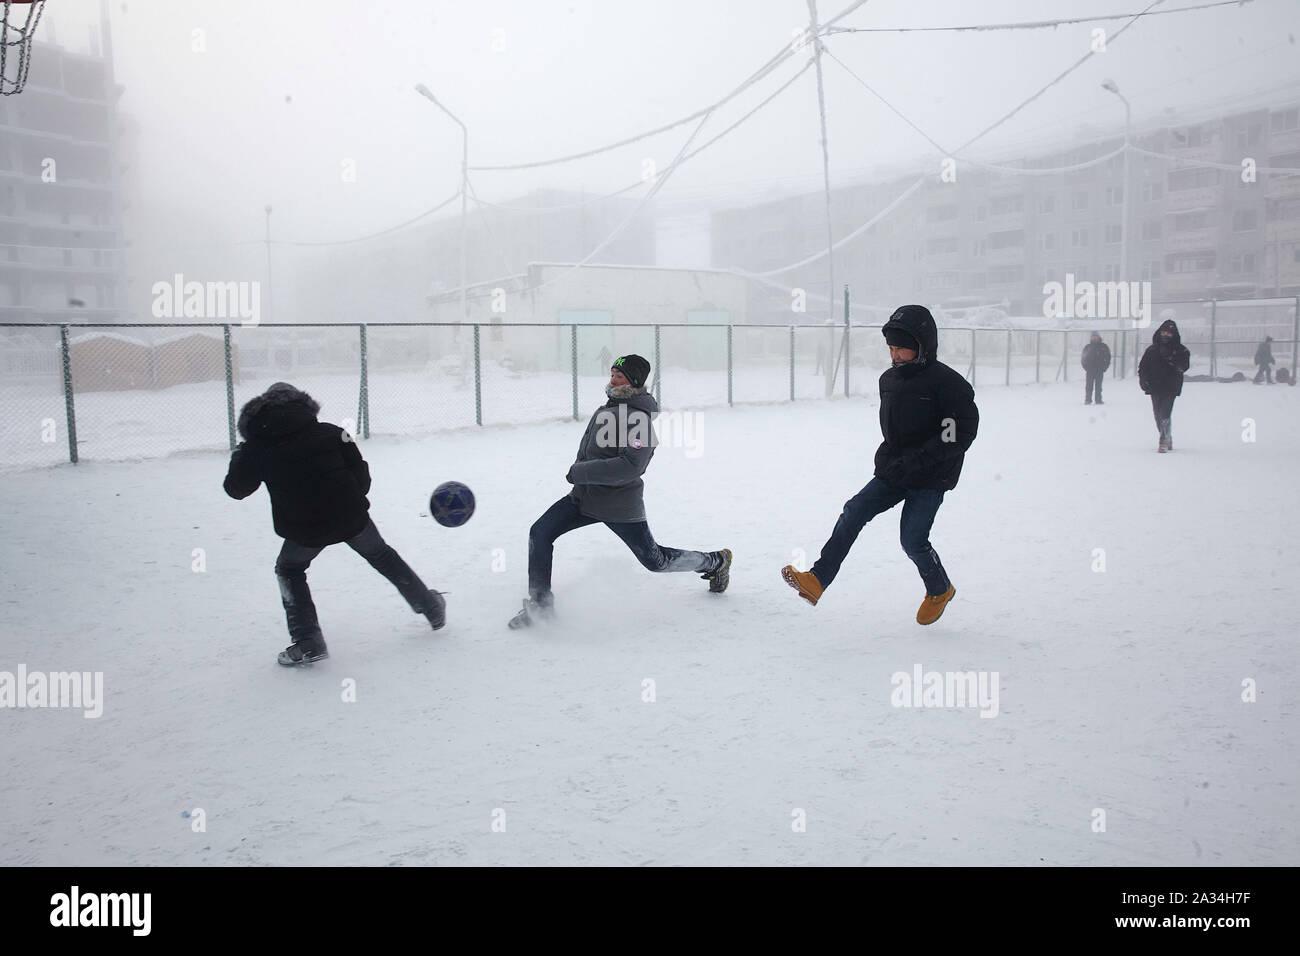 Russia Yakutsk Young people playing footbal -42 degrees Celcius 2-02-2013 photo: Jaco Klamer Stock Photo